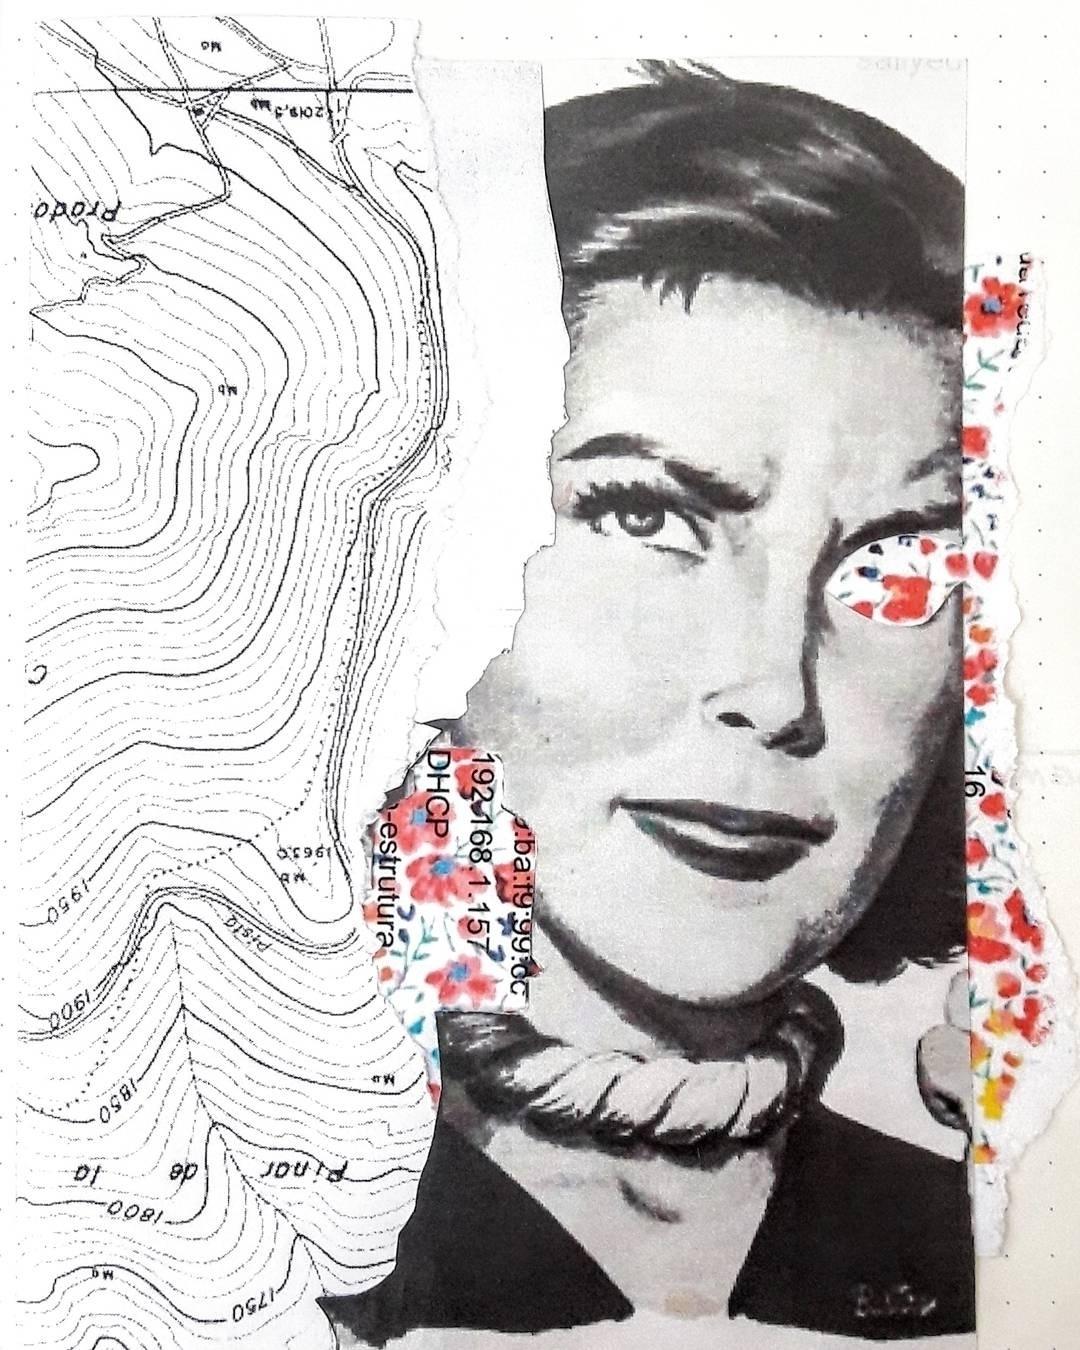 Handmade paper - collage - juareztanure | ello